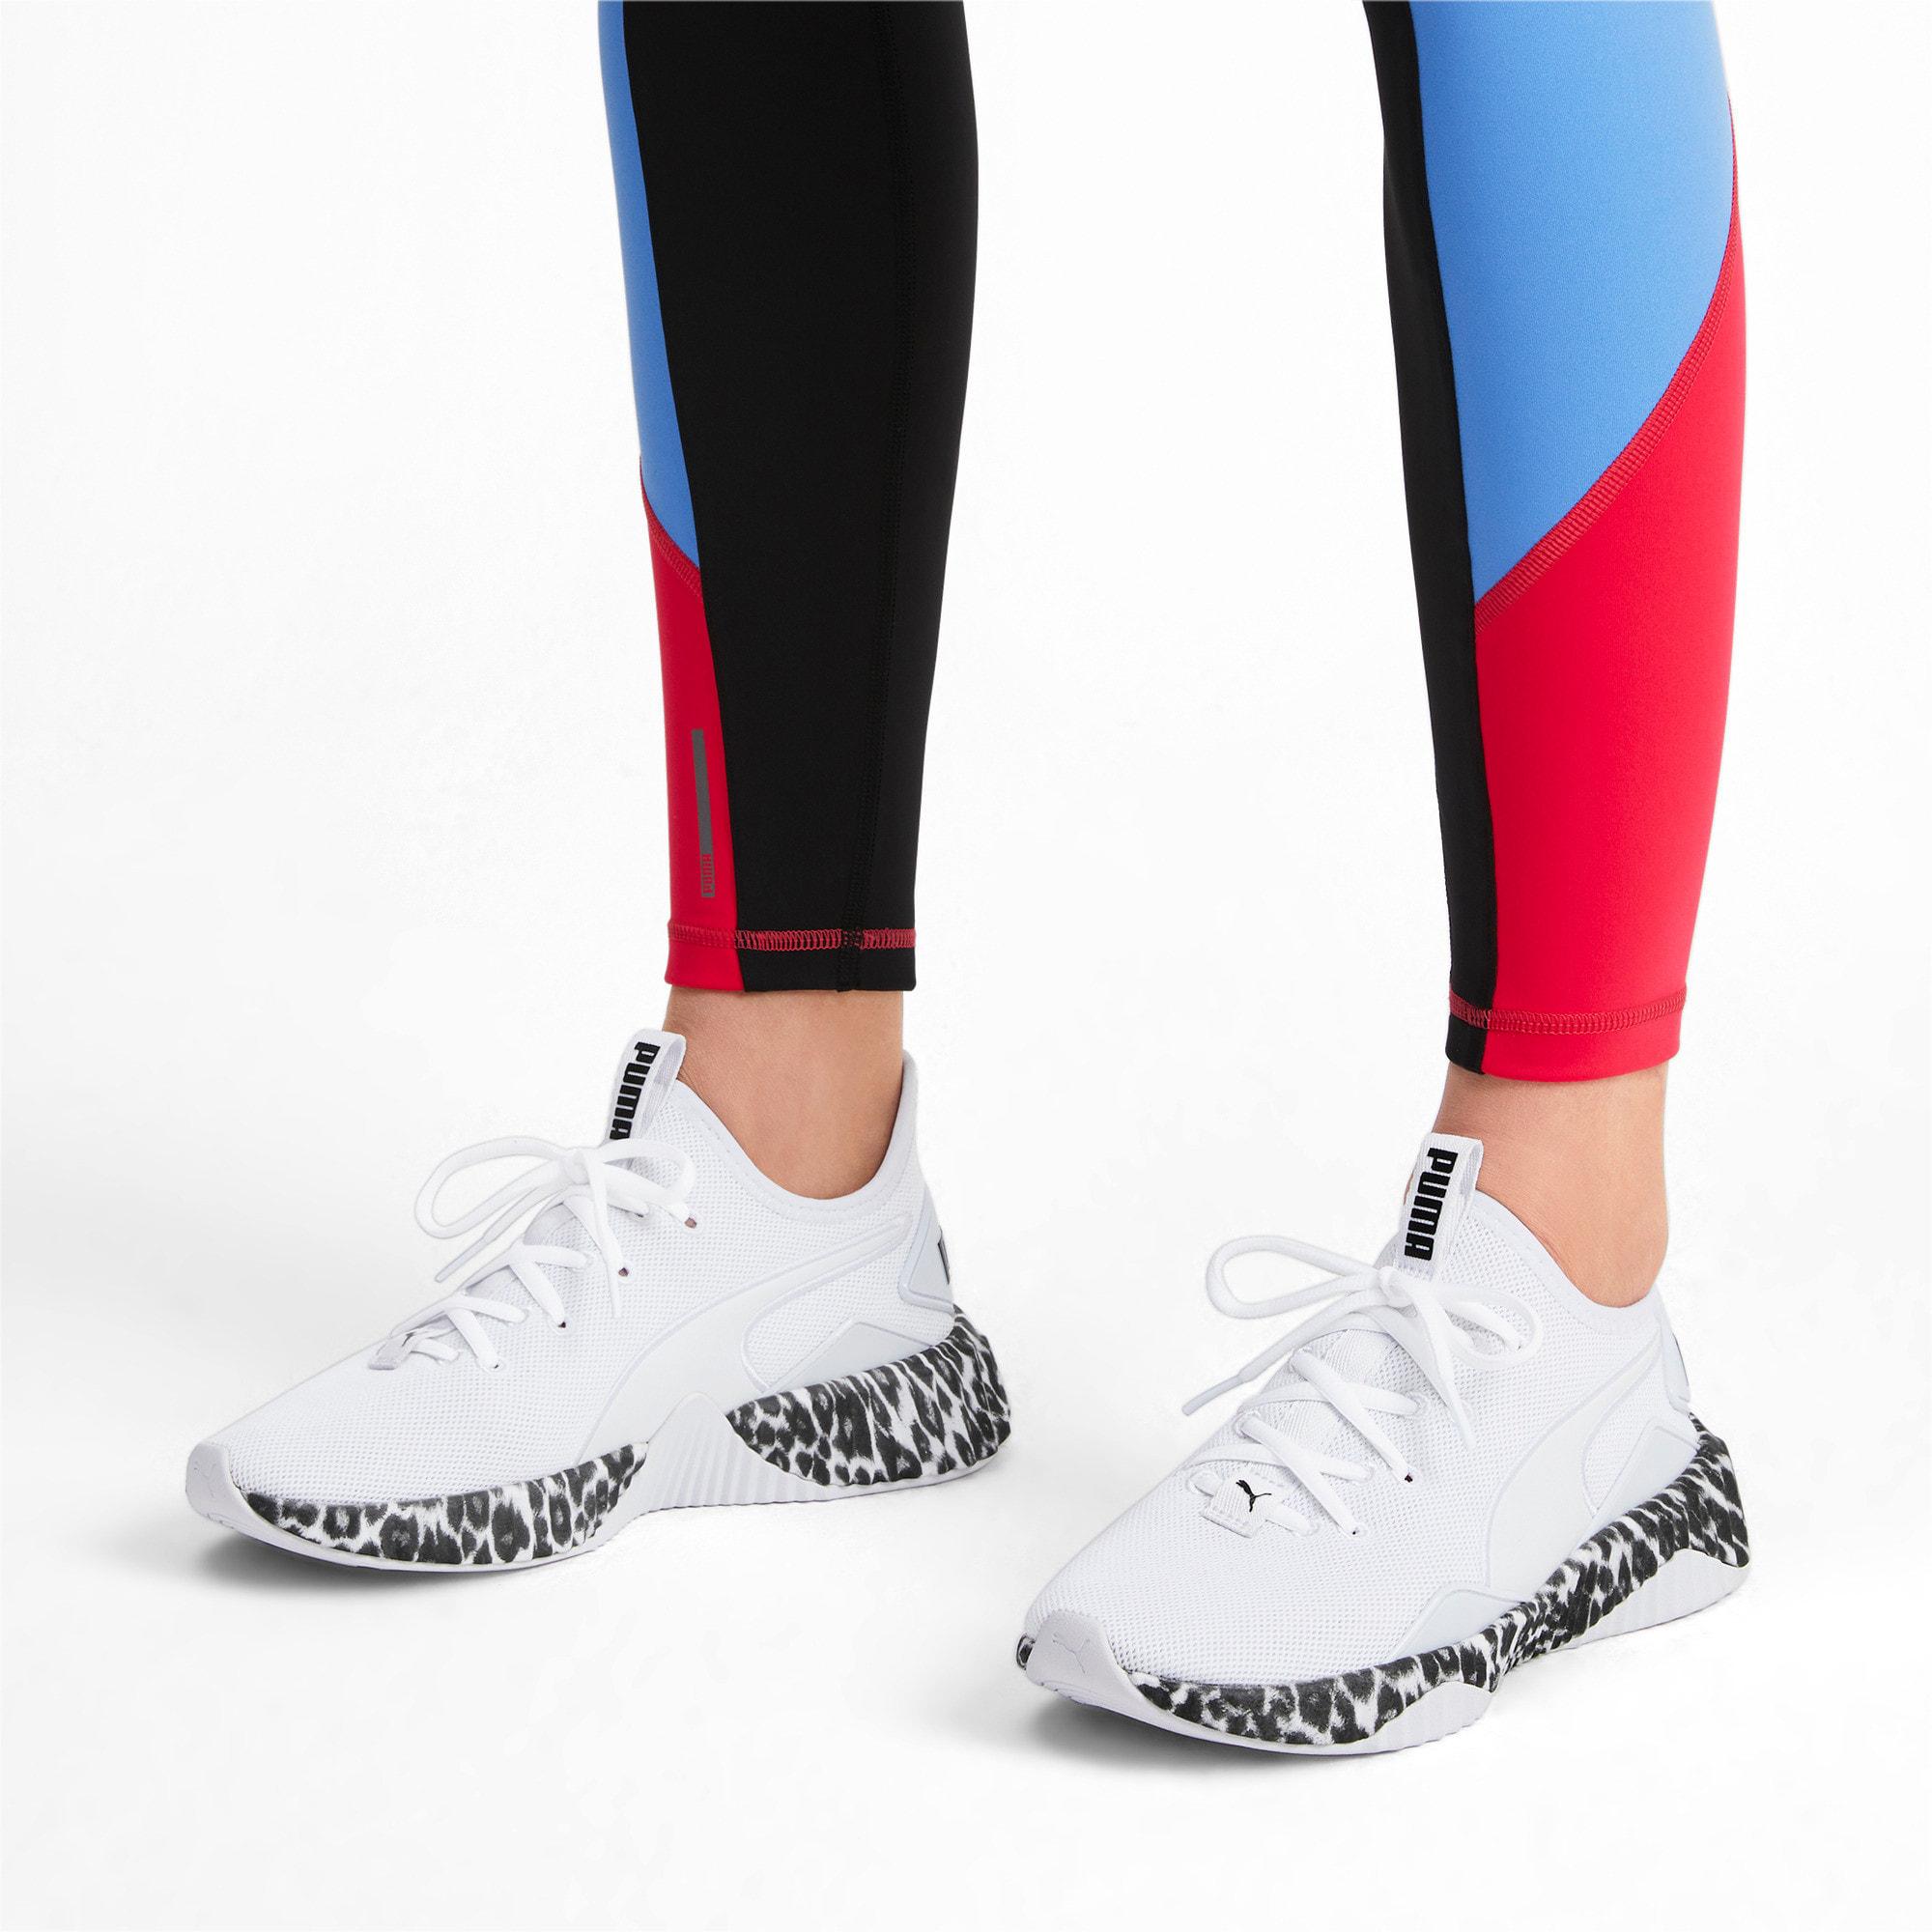 Thumbnail 2 of Defy Leopard Women's Sneakers, Puma White-Puma Black, medium